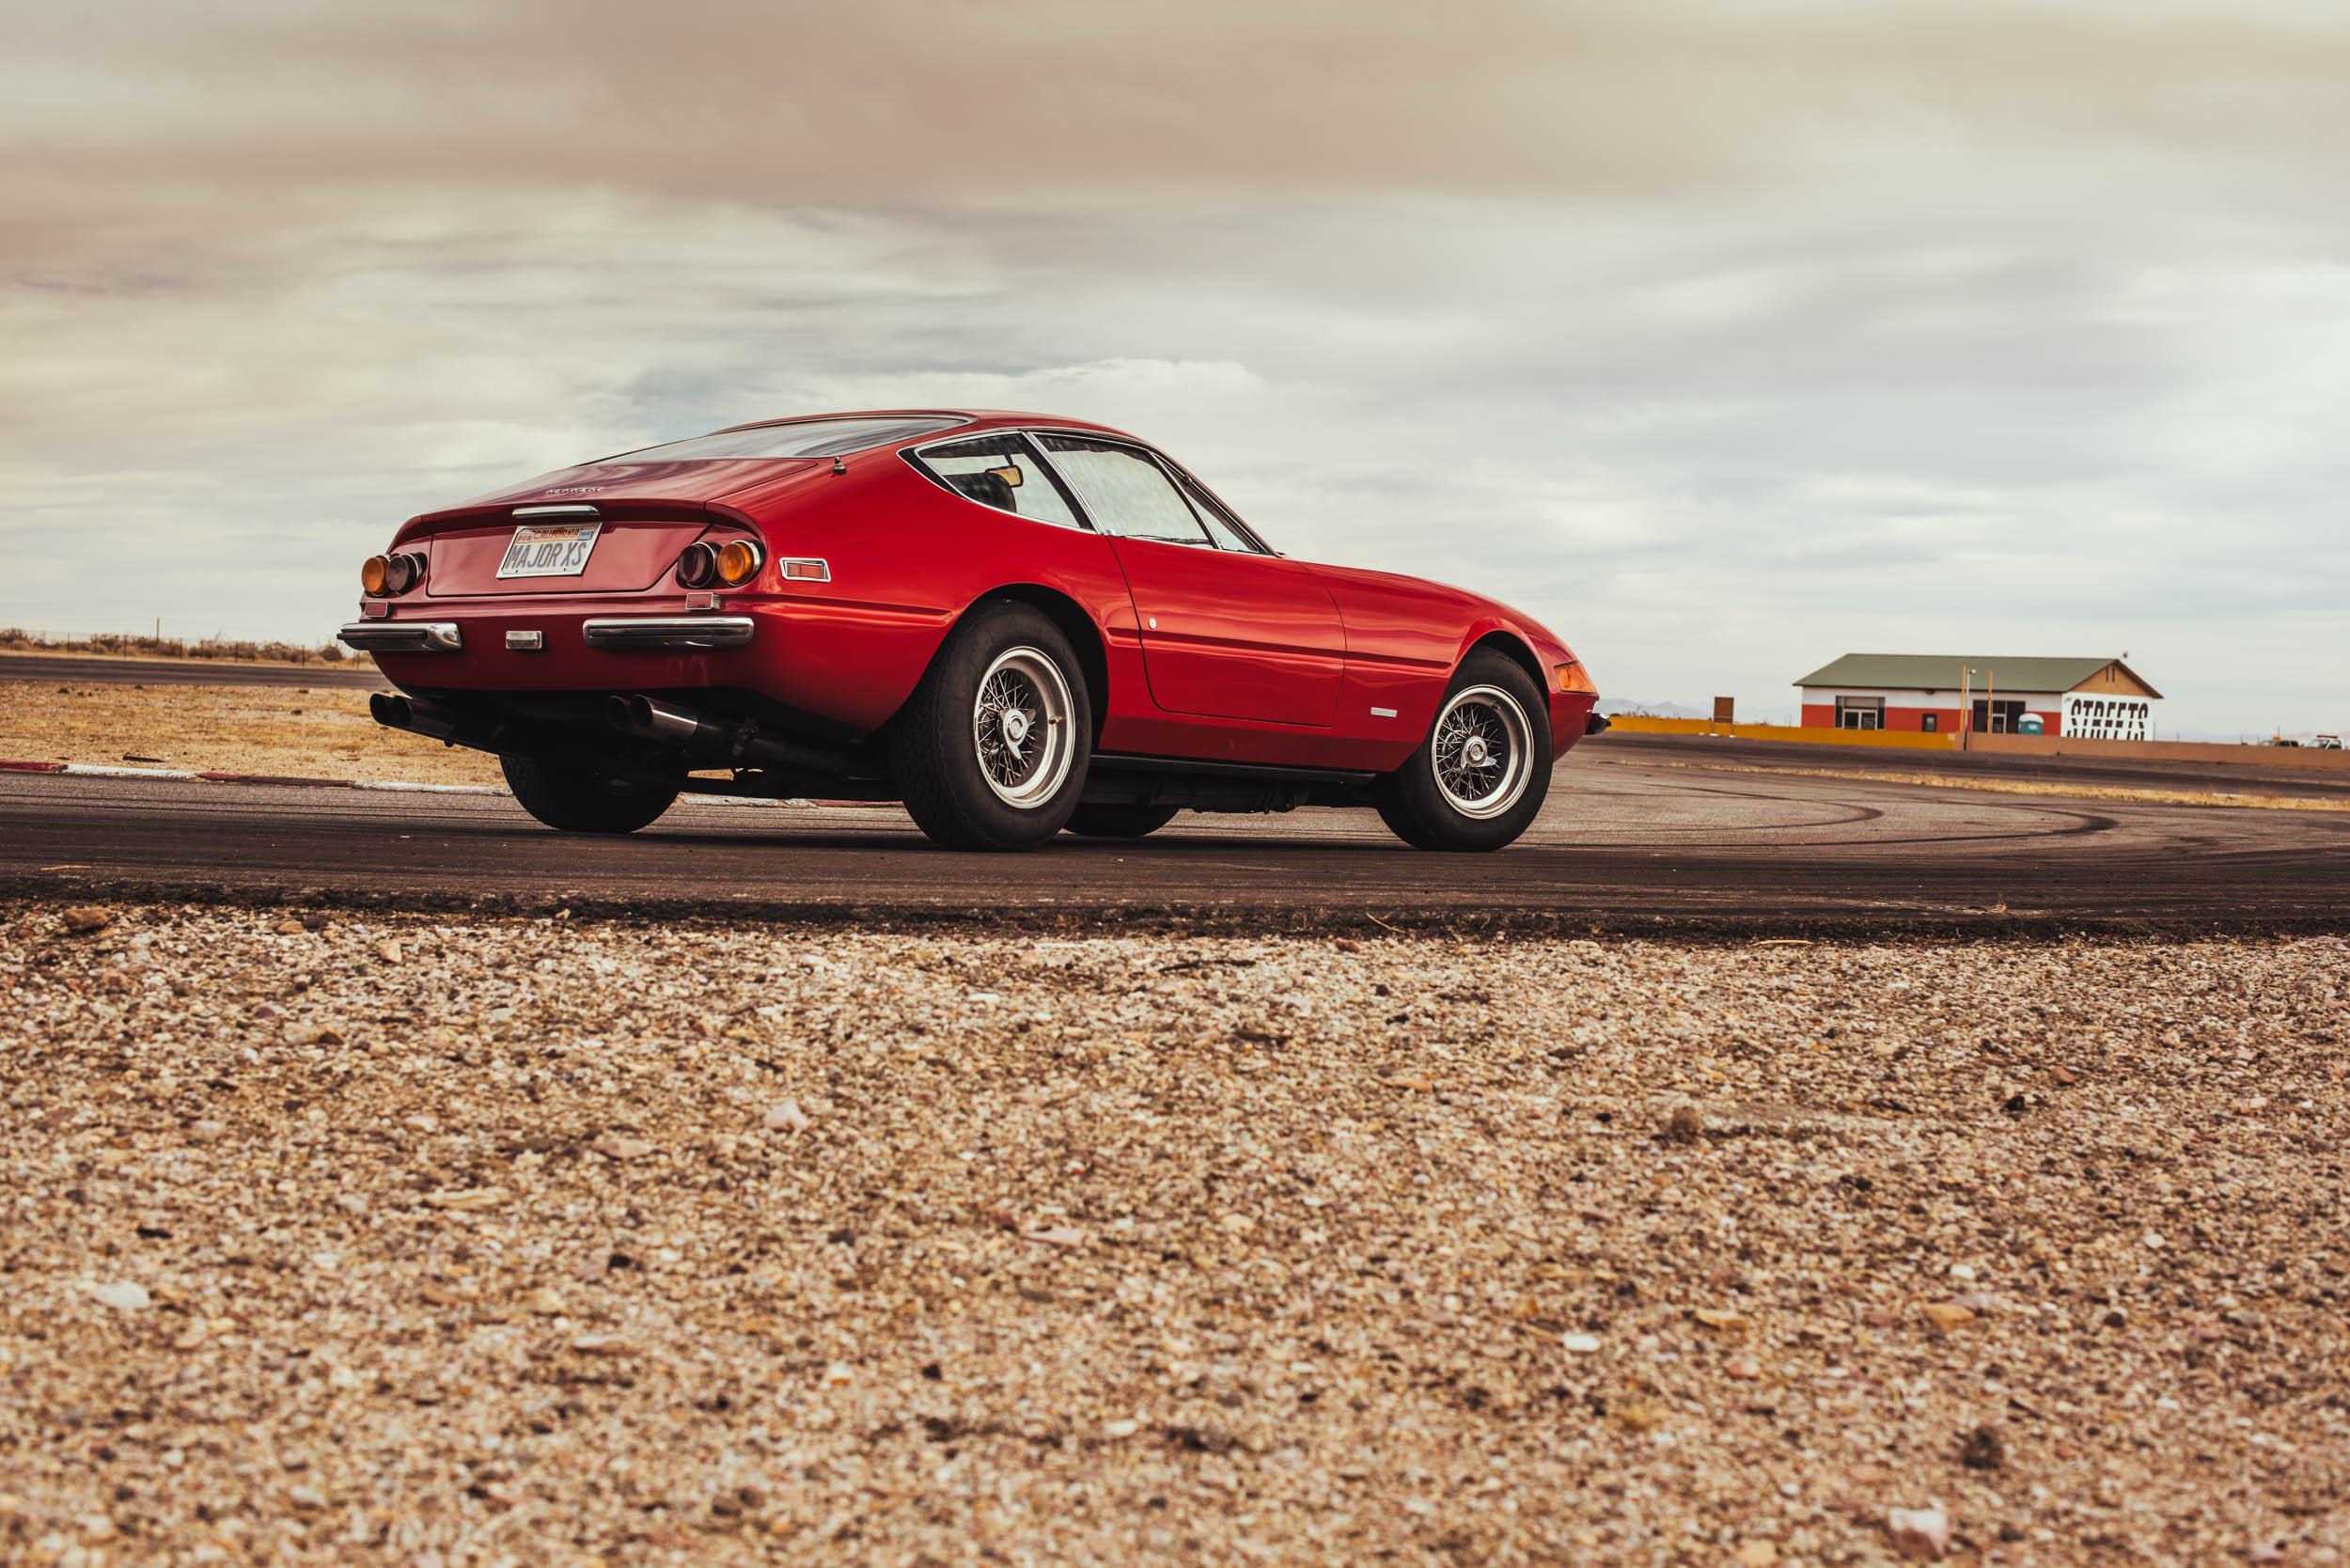 1971 Ferrari Daytona 365 GTB/4 rear 3/4